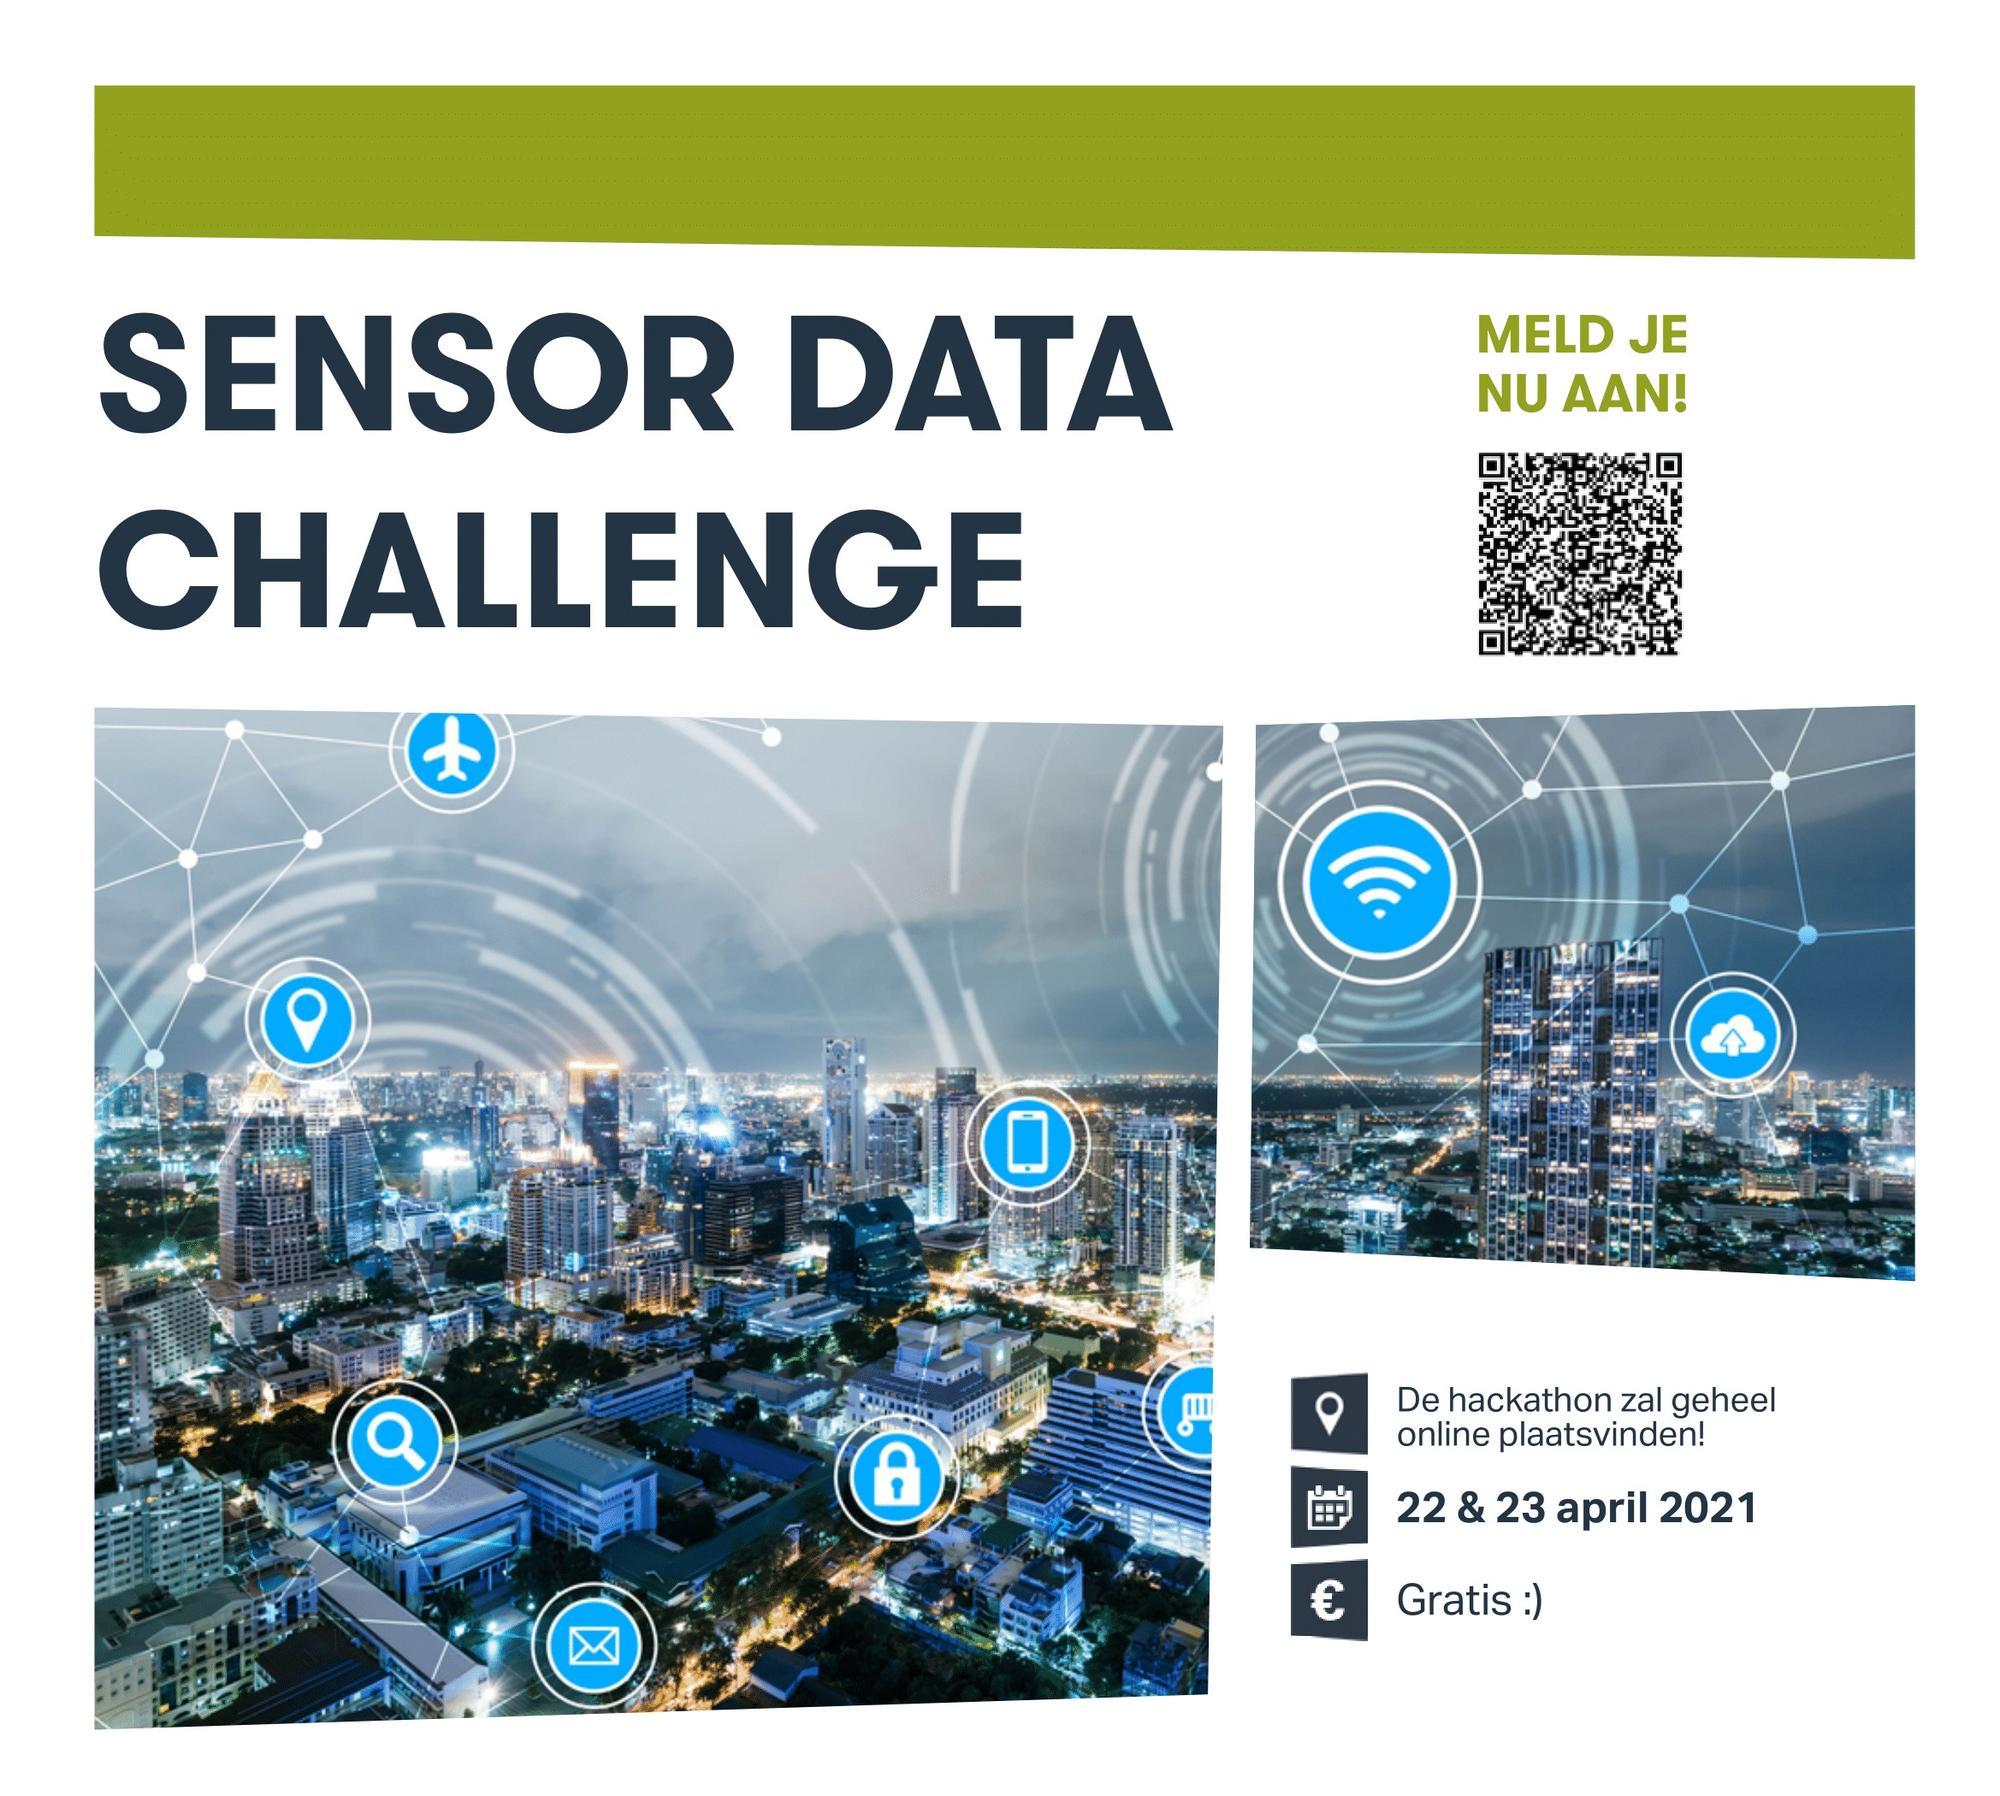 Sensor data challenge